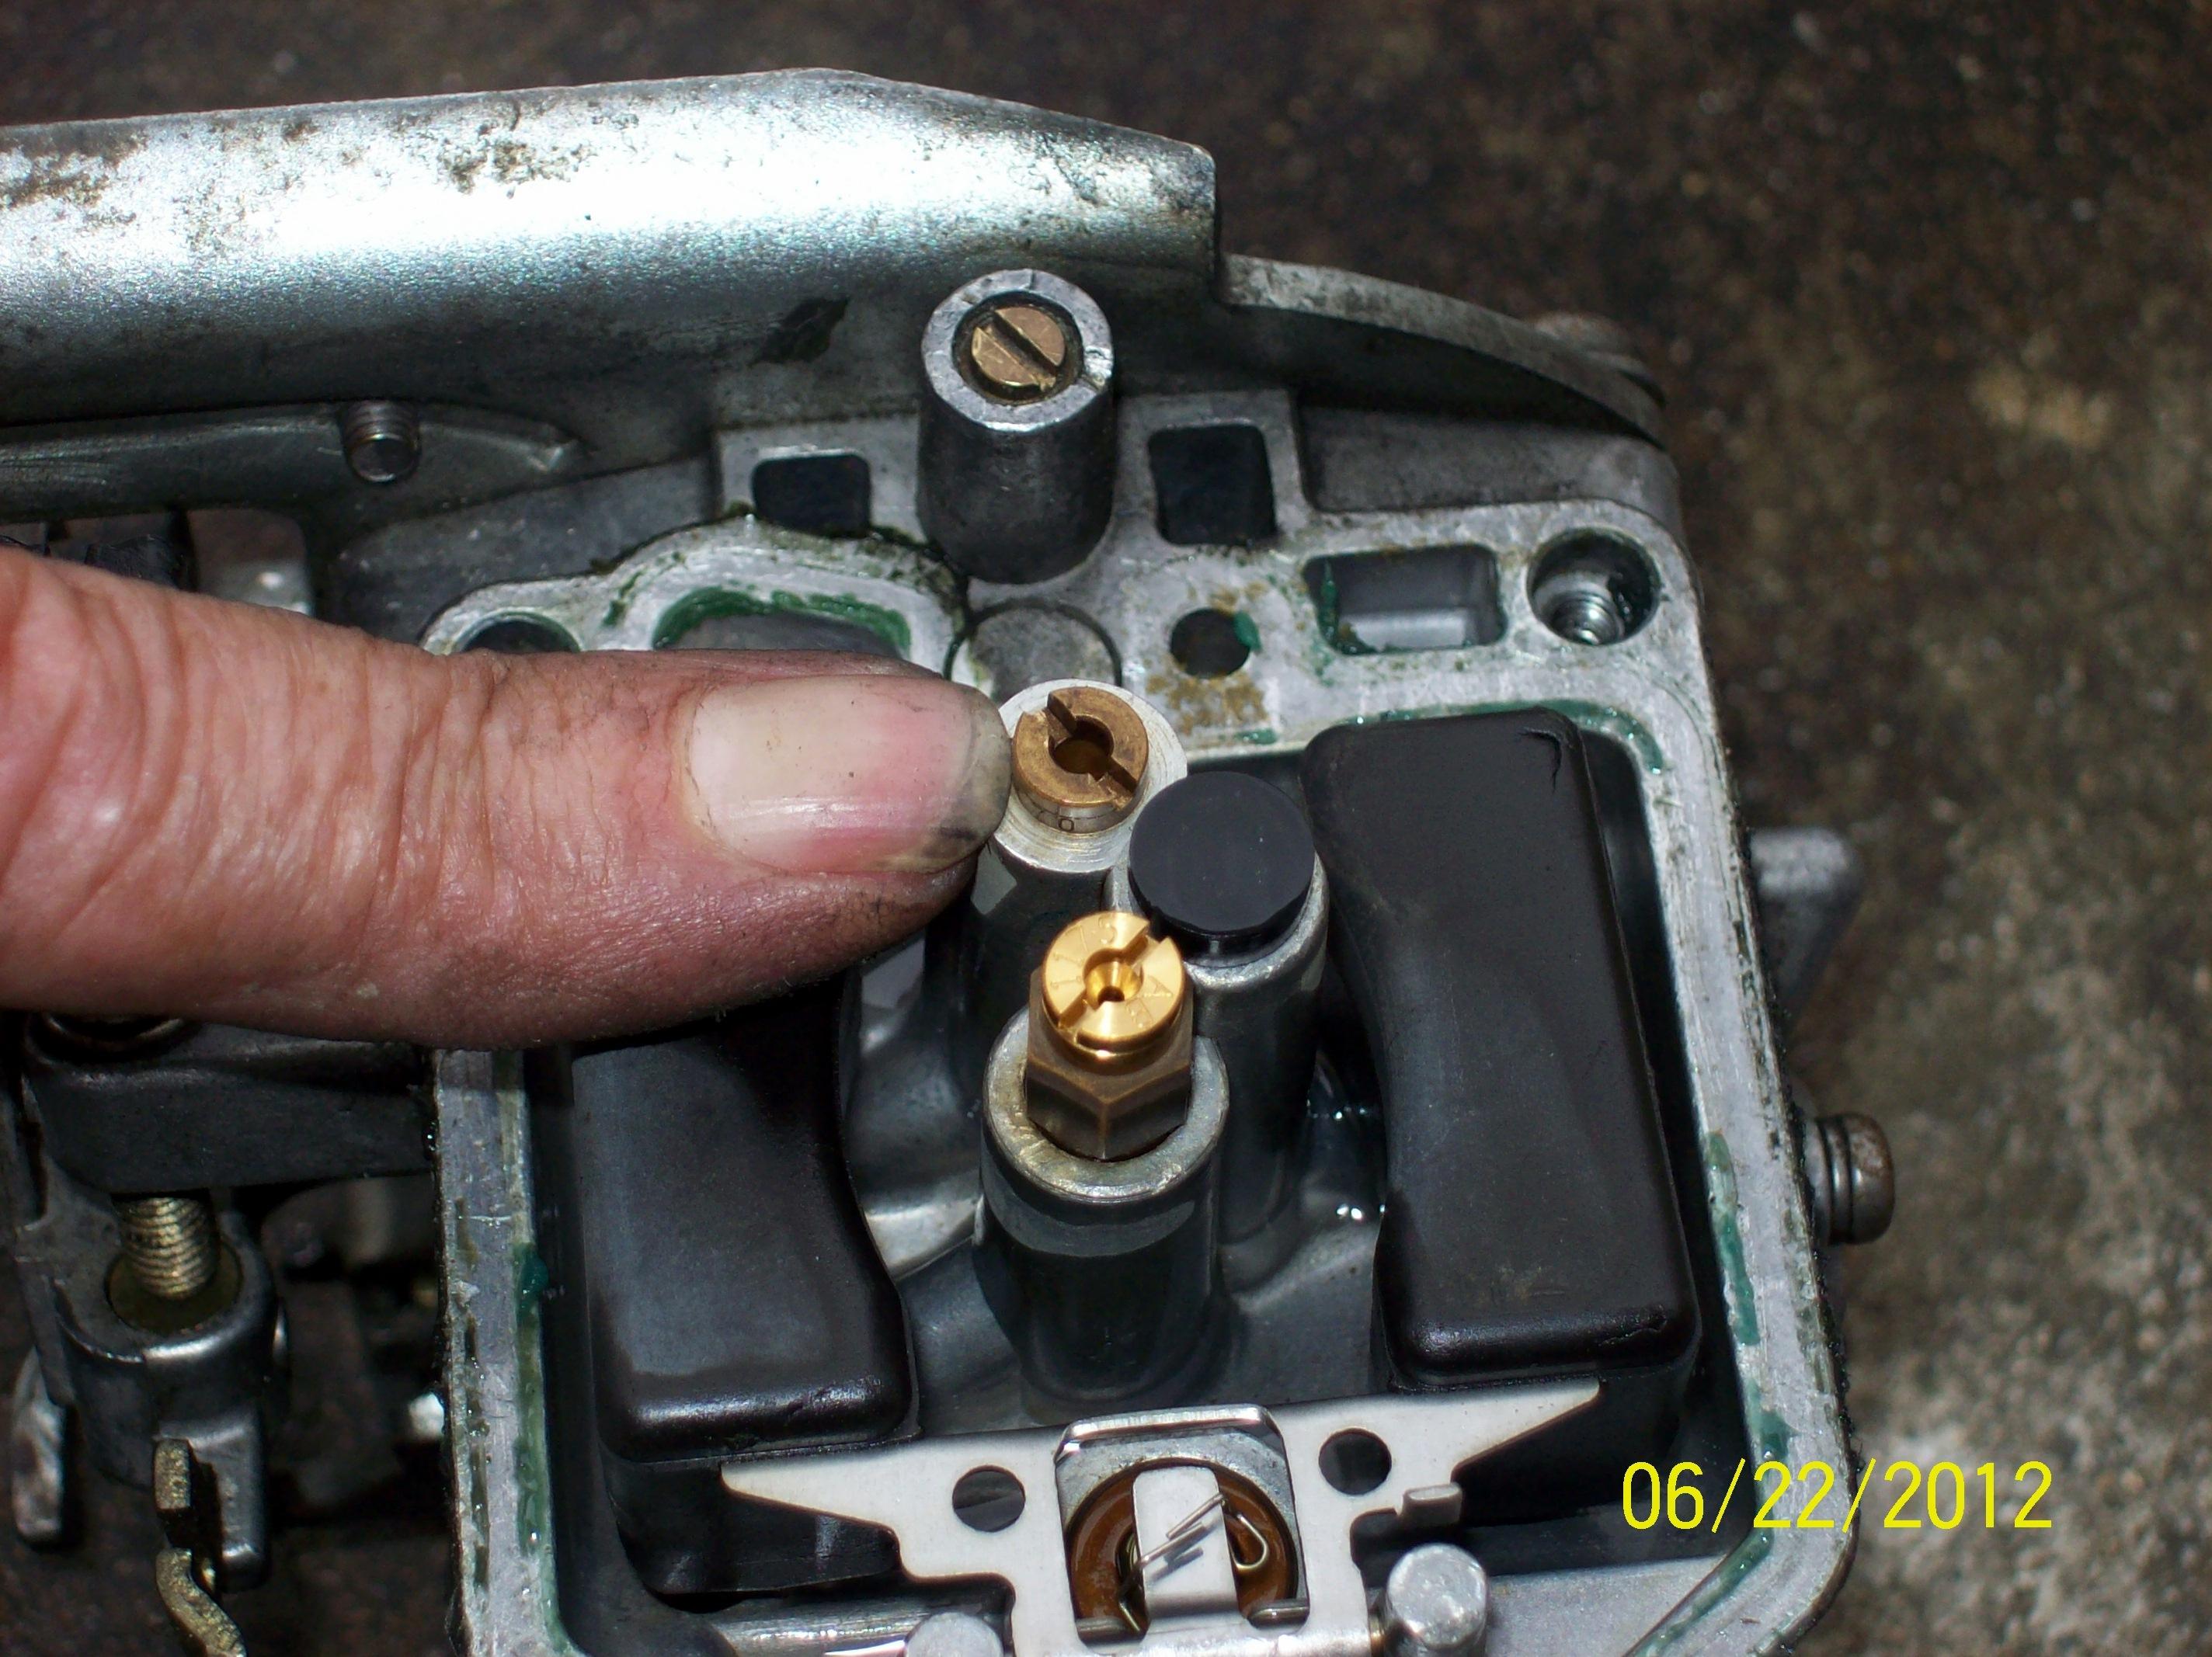 Honda Cm400 Carburetor Adjustments Electrical Wiring Diagram Of Cm400a 2848x2134